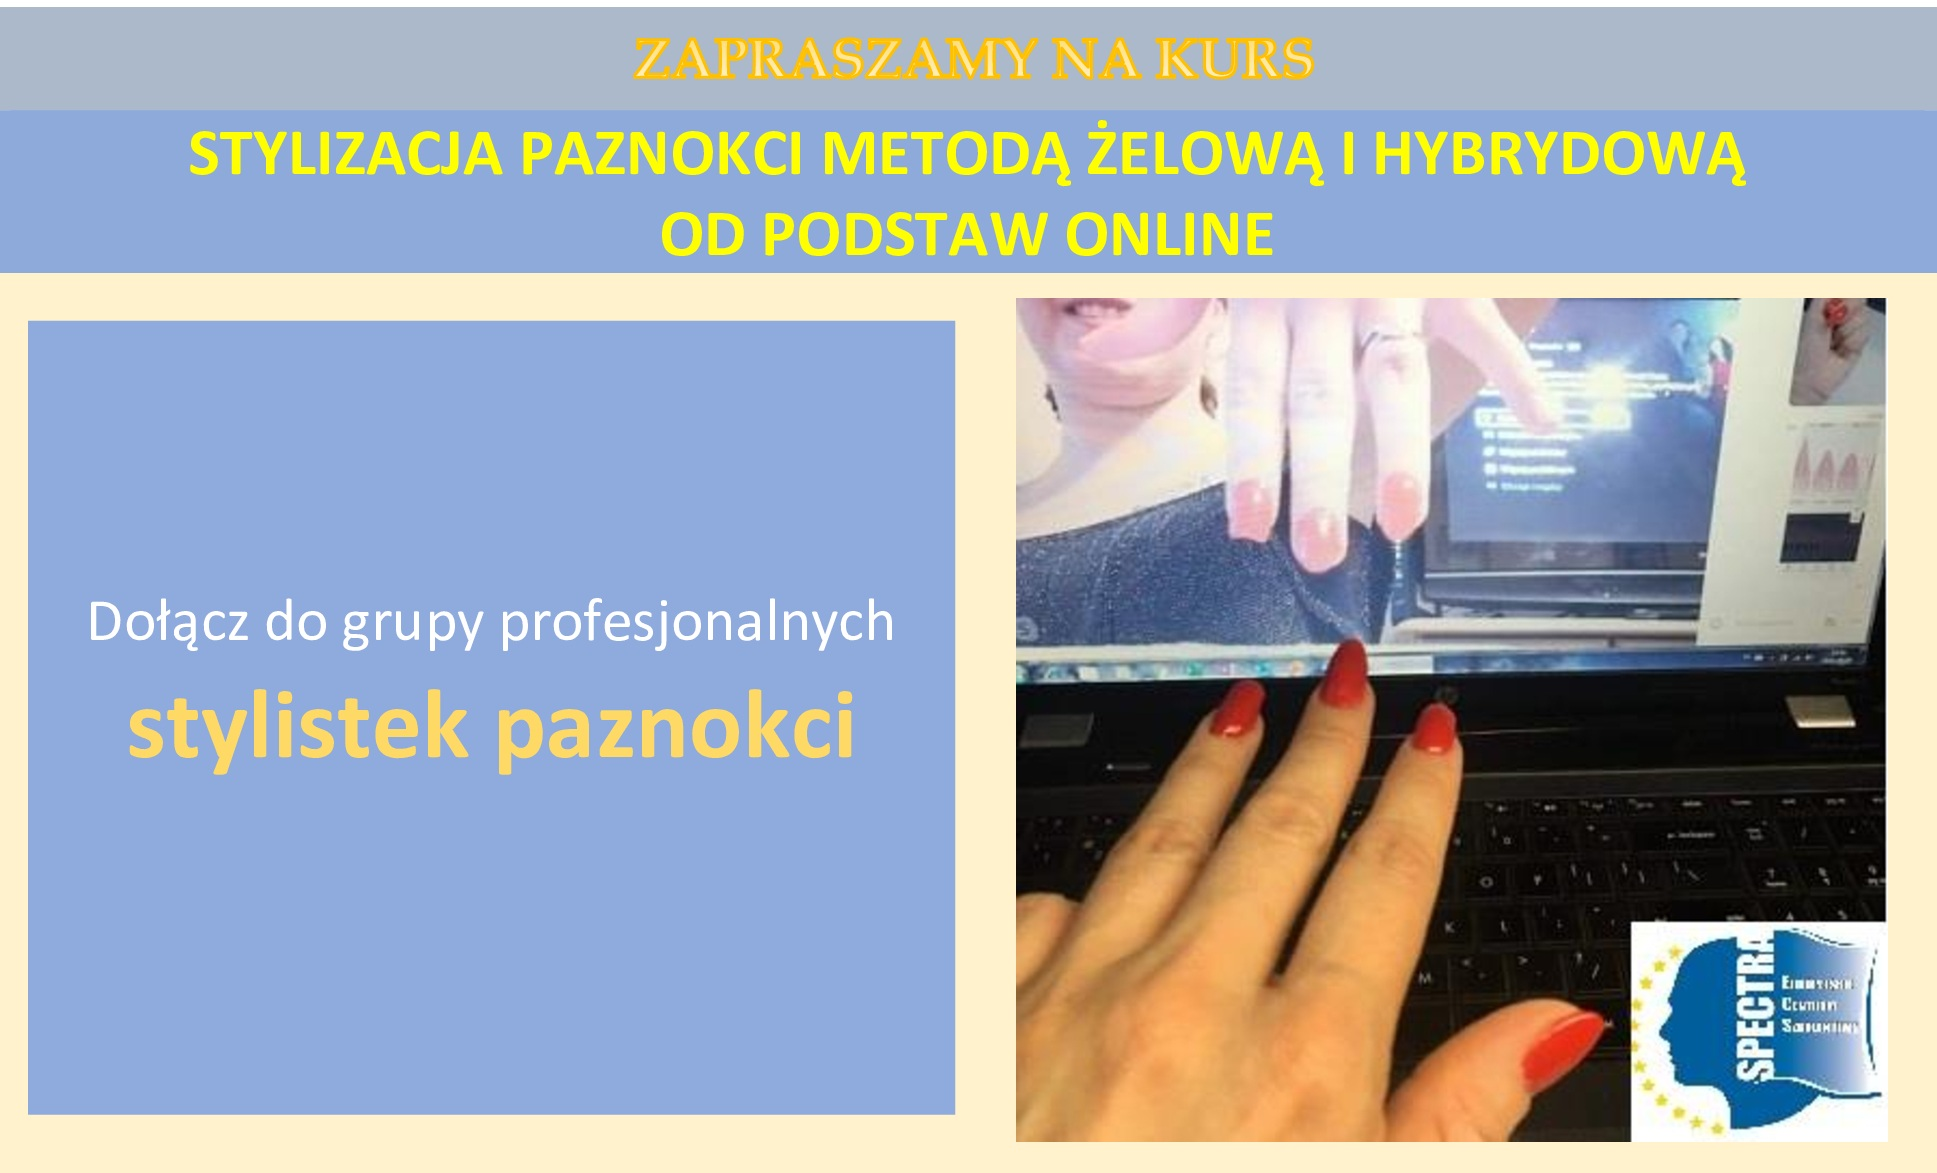 fcefcc692da520dd34a0abdf1011632d-0